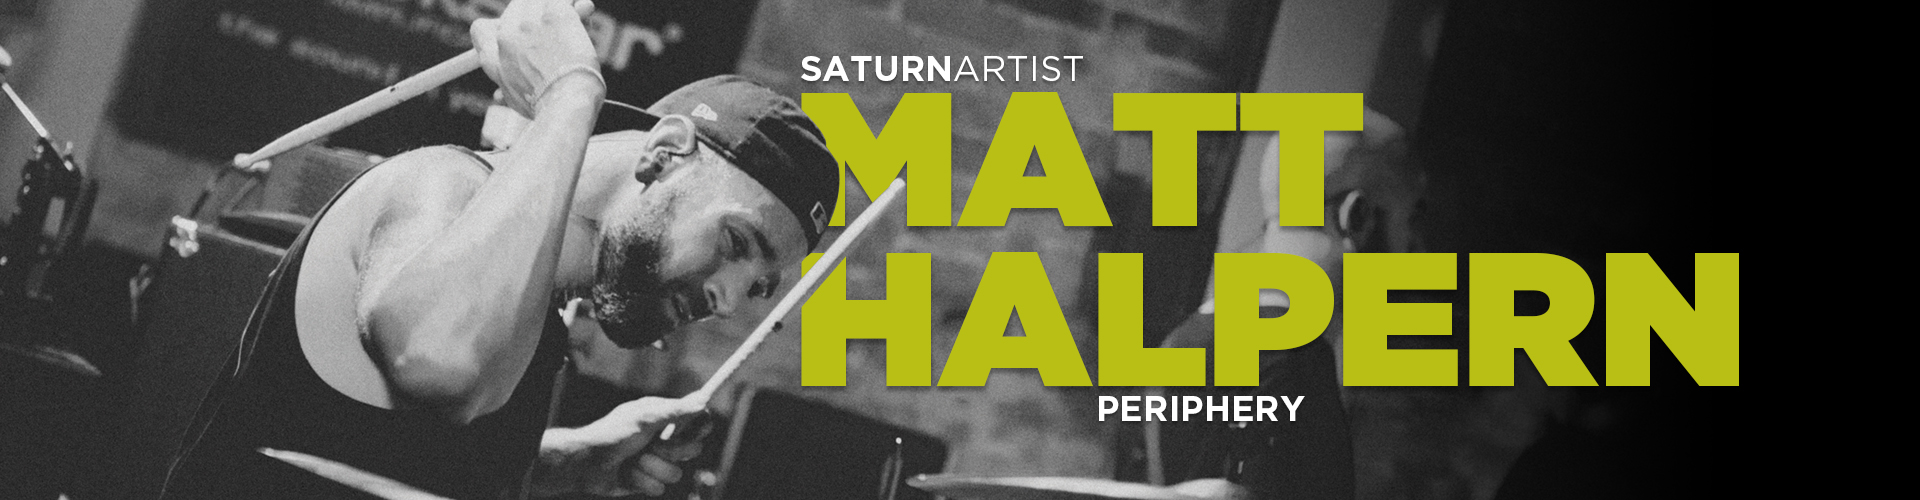 Matt Halpern Saturn Artist